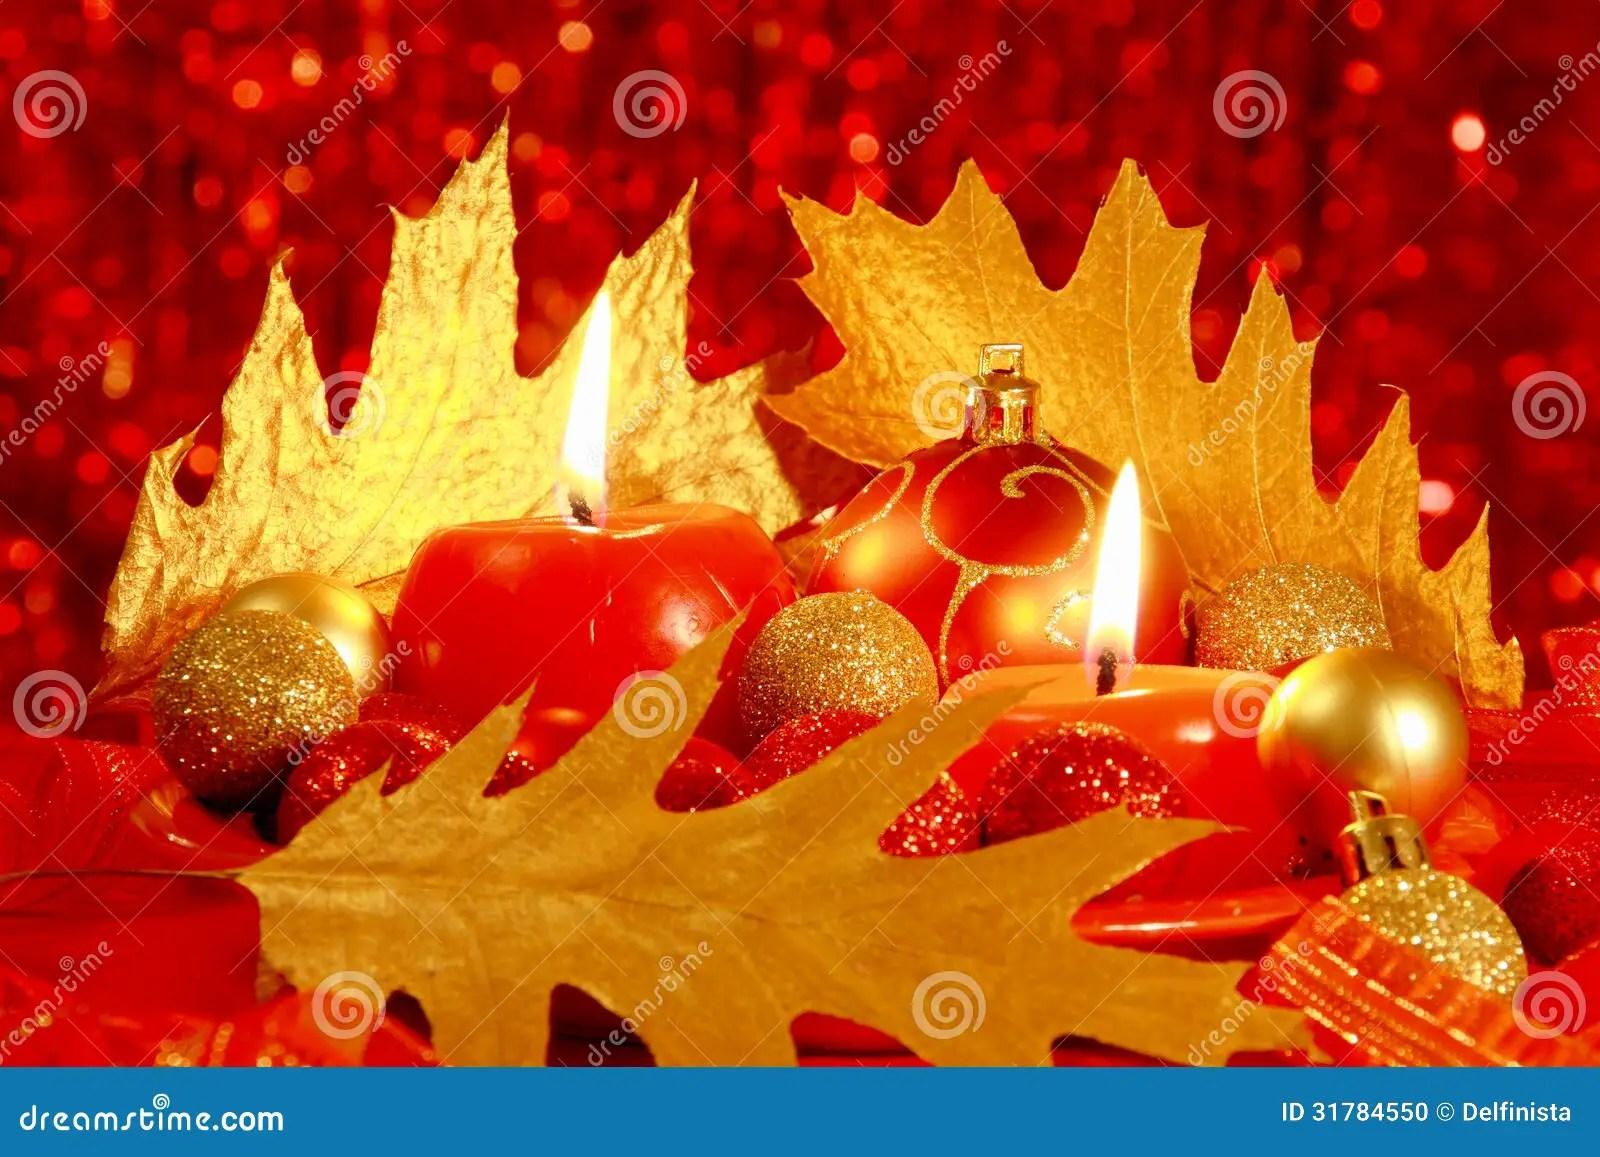 Red Christmas Card Balls Amp Candles Stock Photos Stock